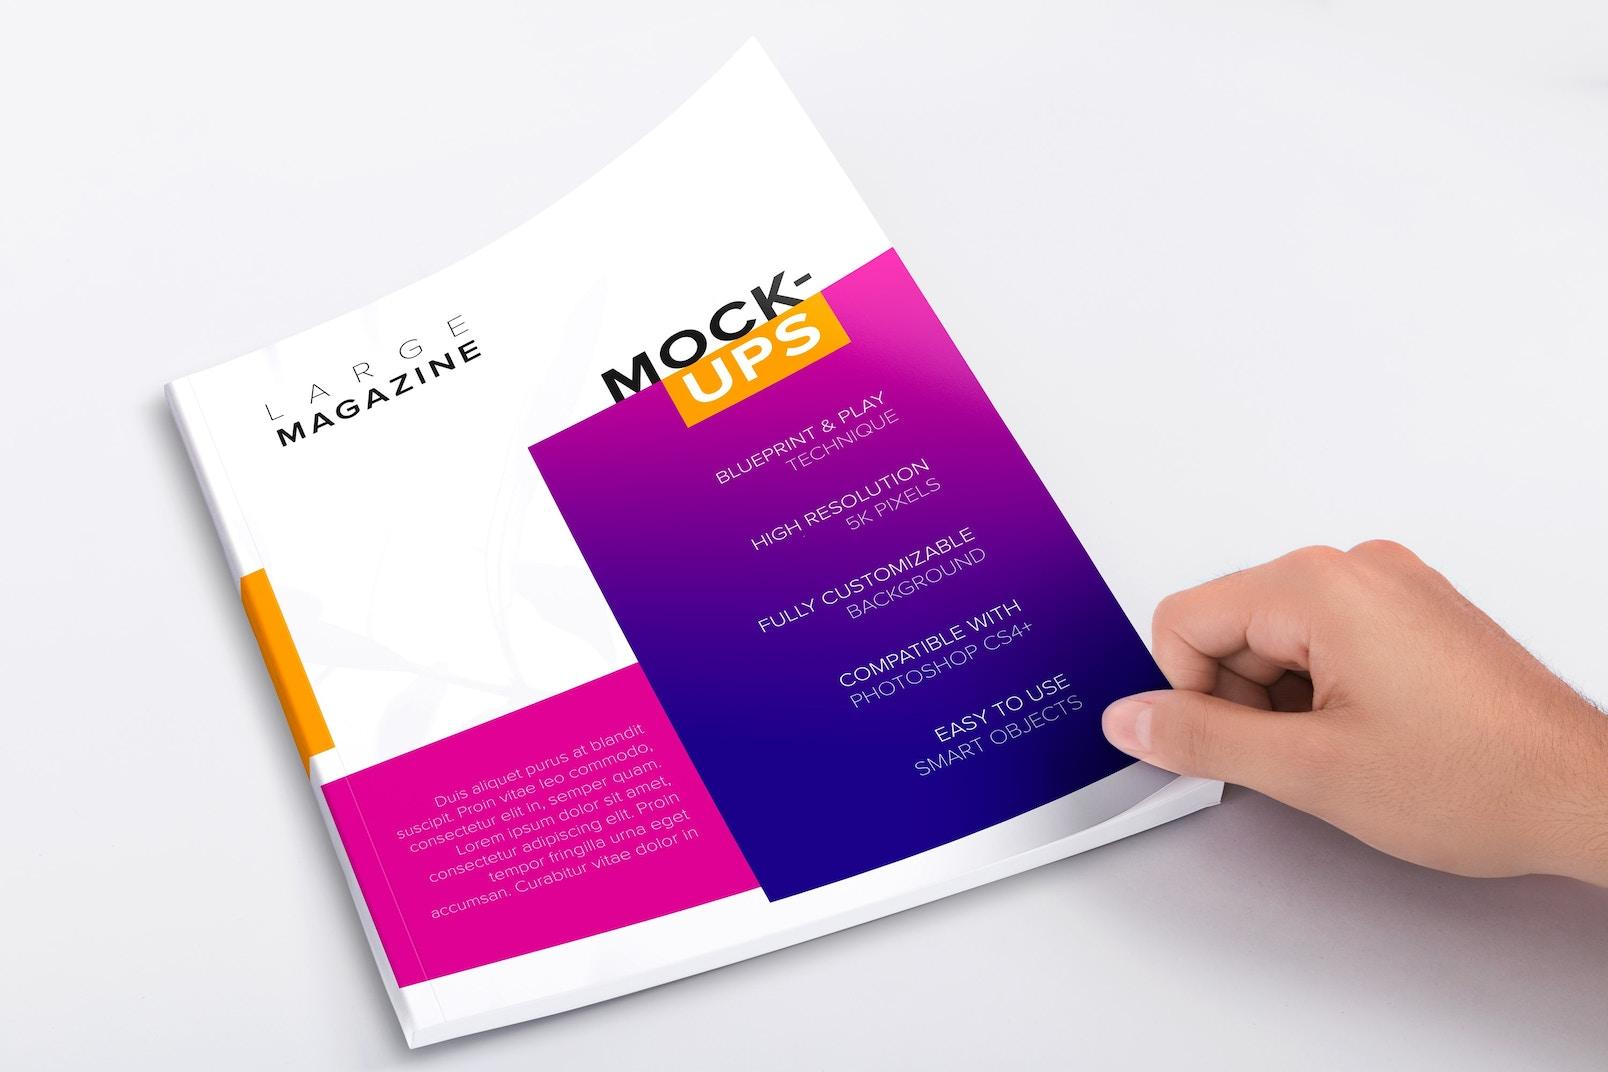 Maqueta para Portada de Revista Grande 02